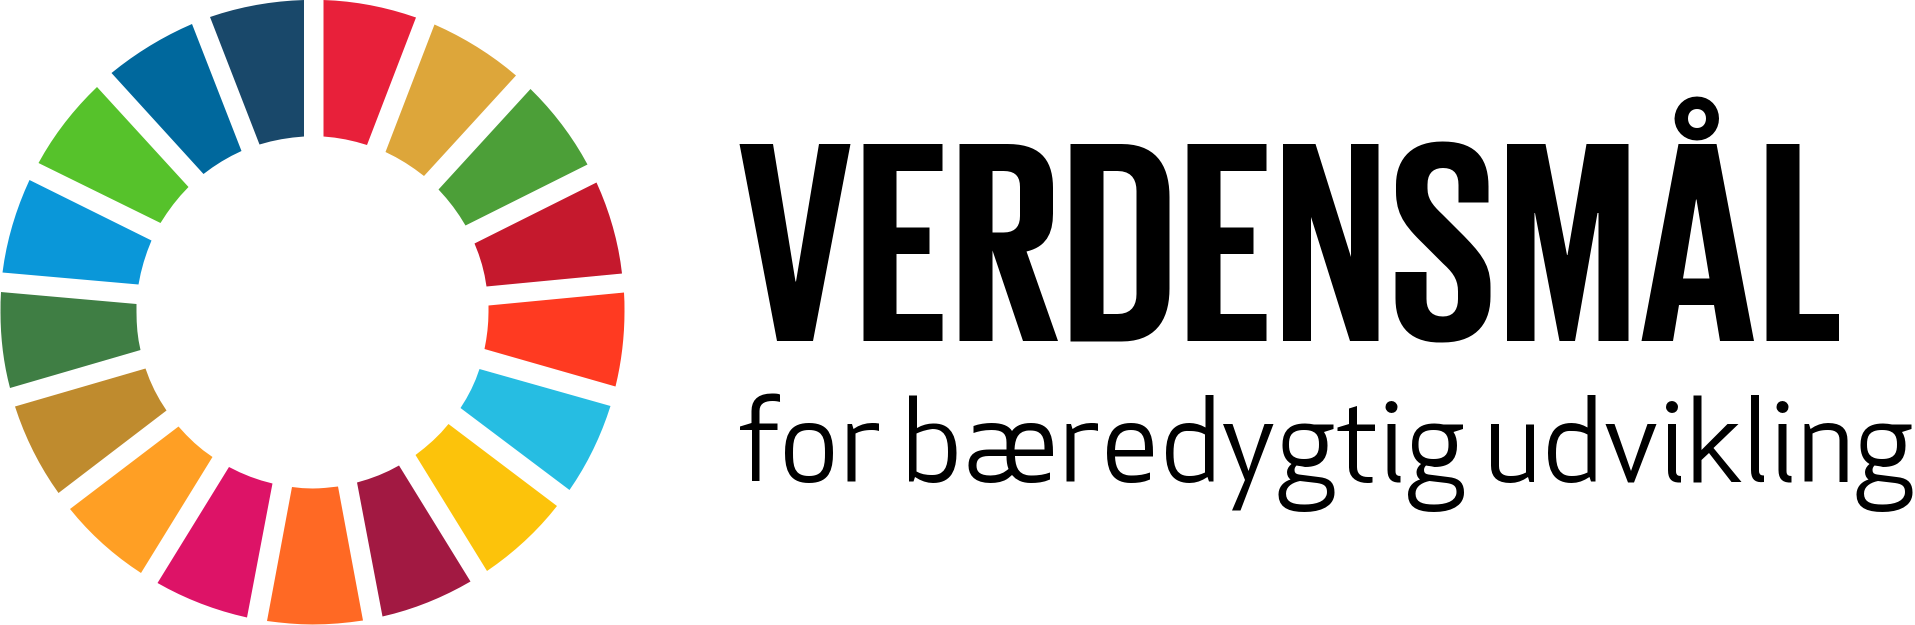 Verdensmaalene Logo Horizontalt